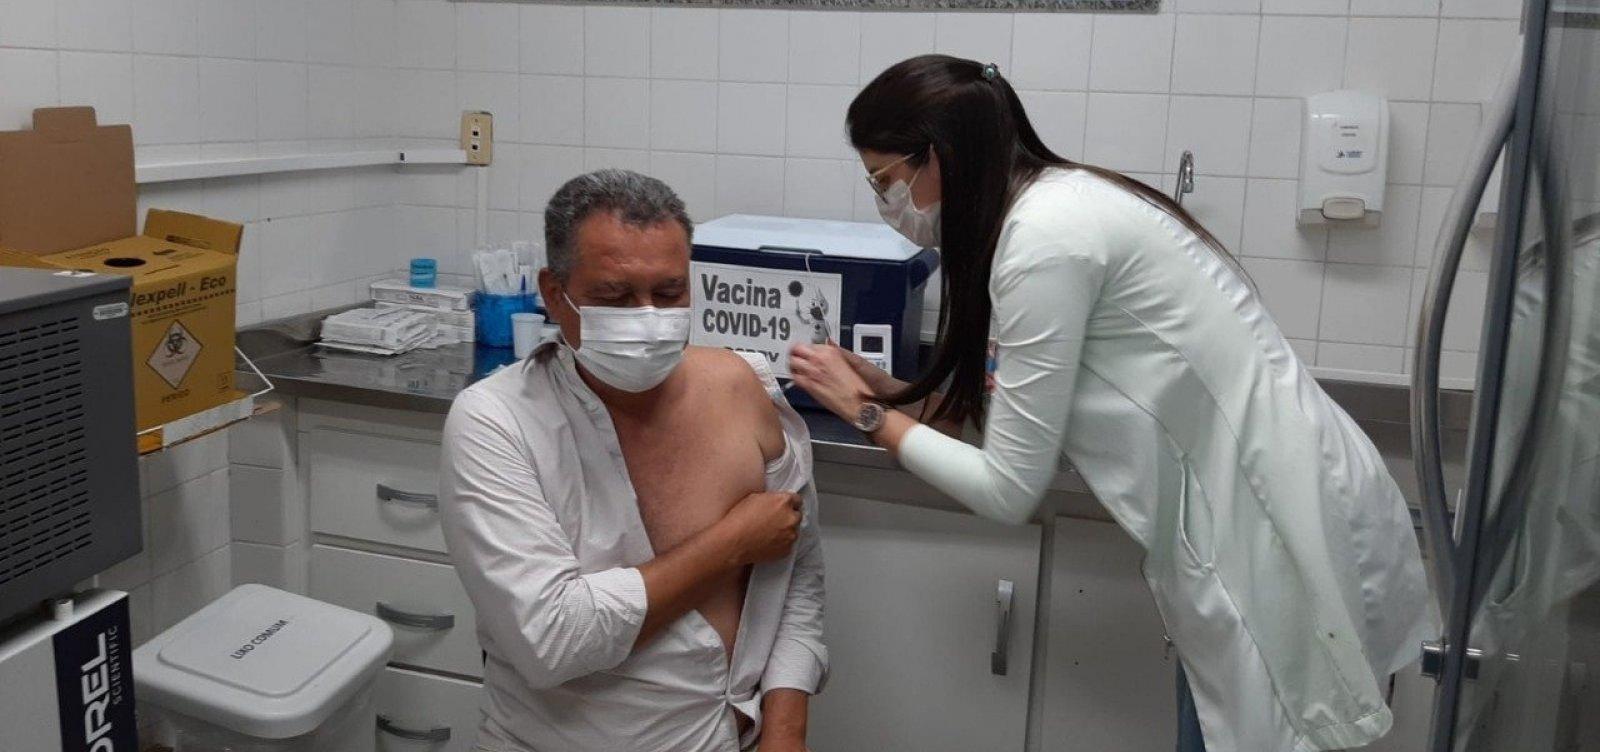 Rui Costa recebe segunda dose da vacina contra Covid-19 nesta sexta